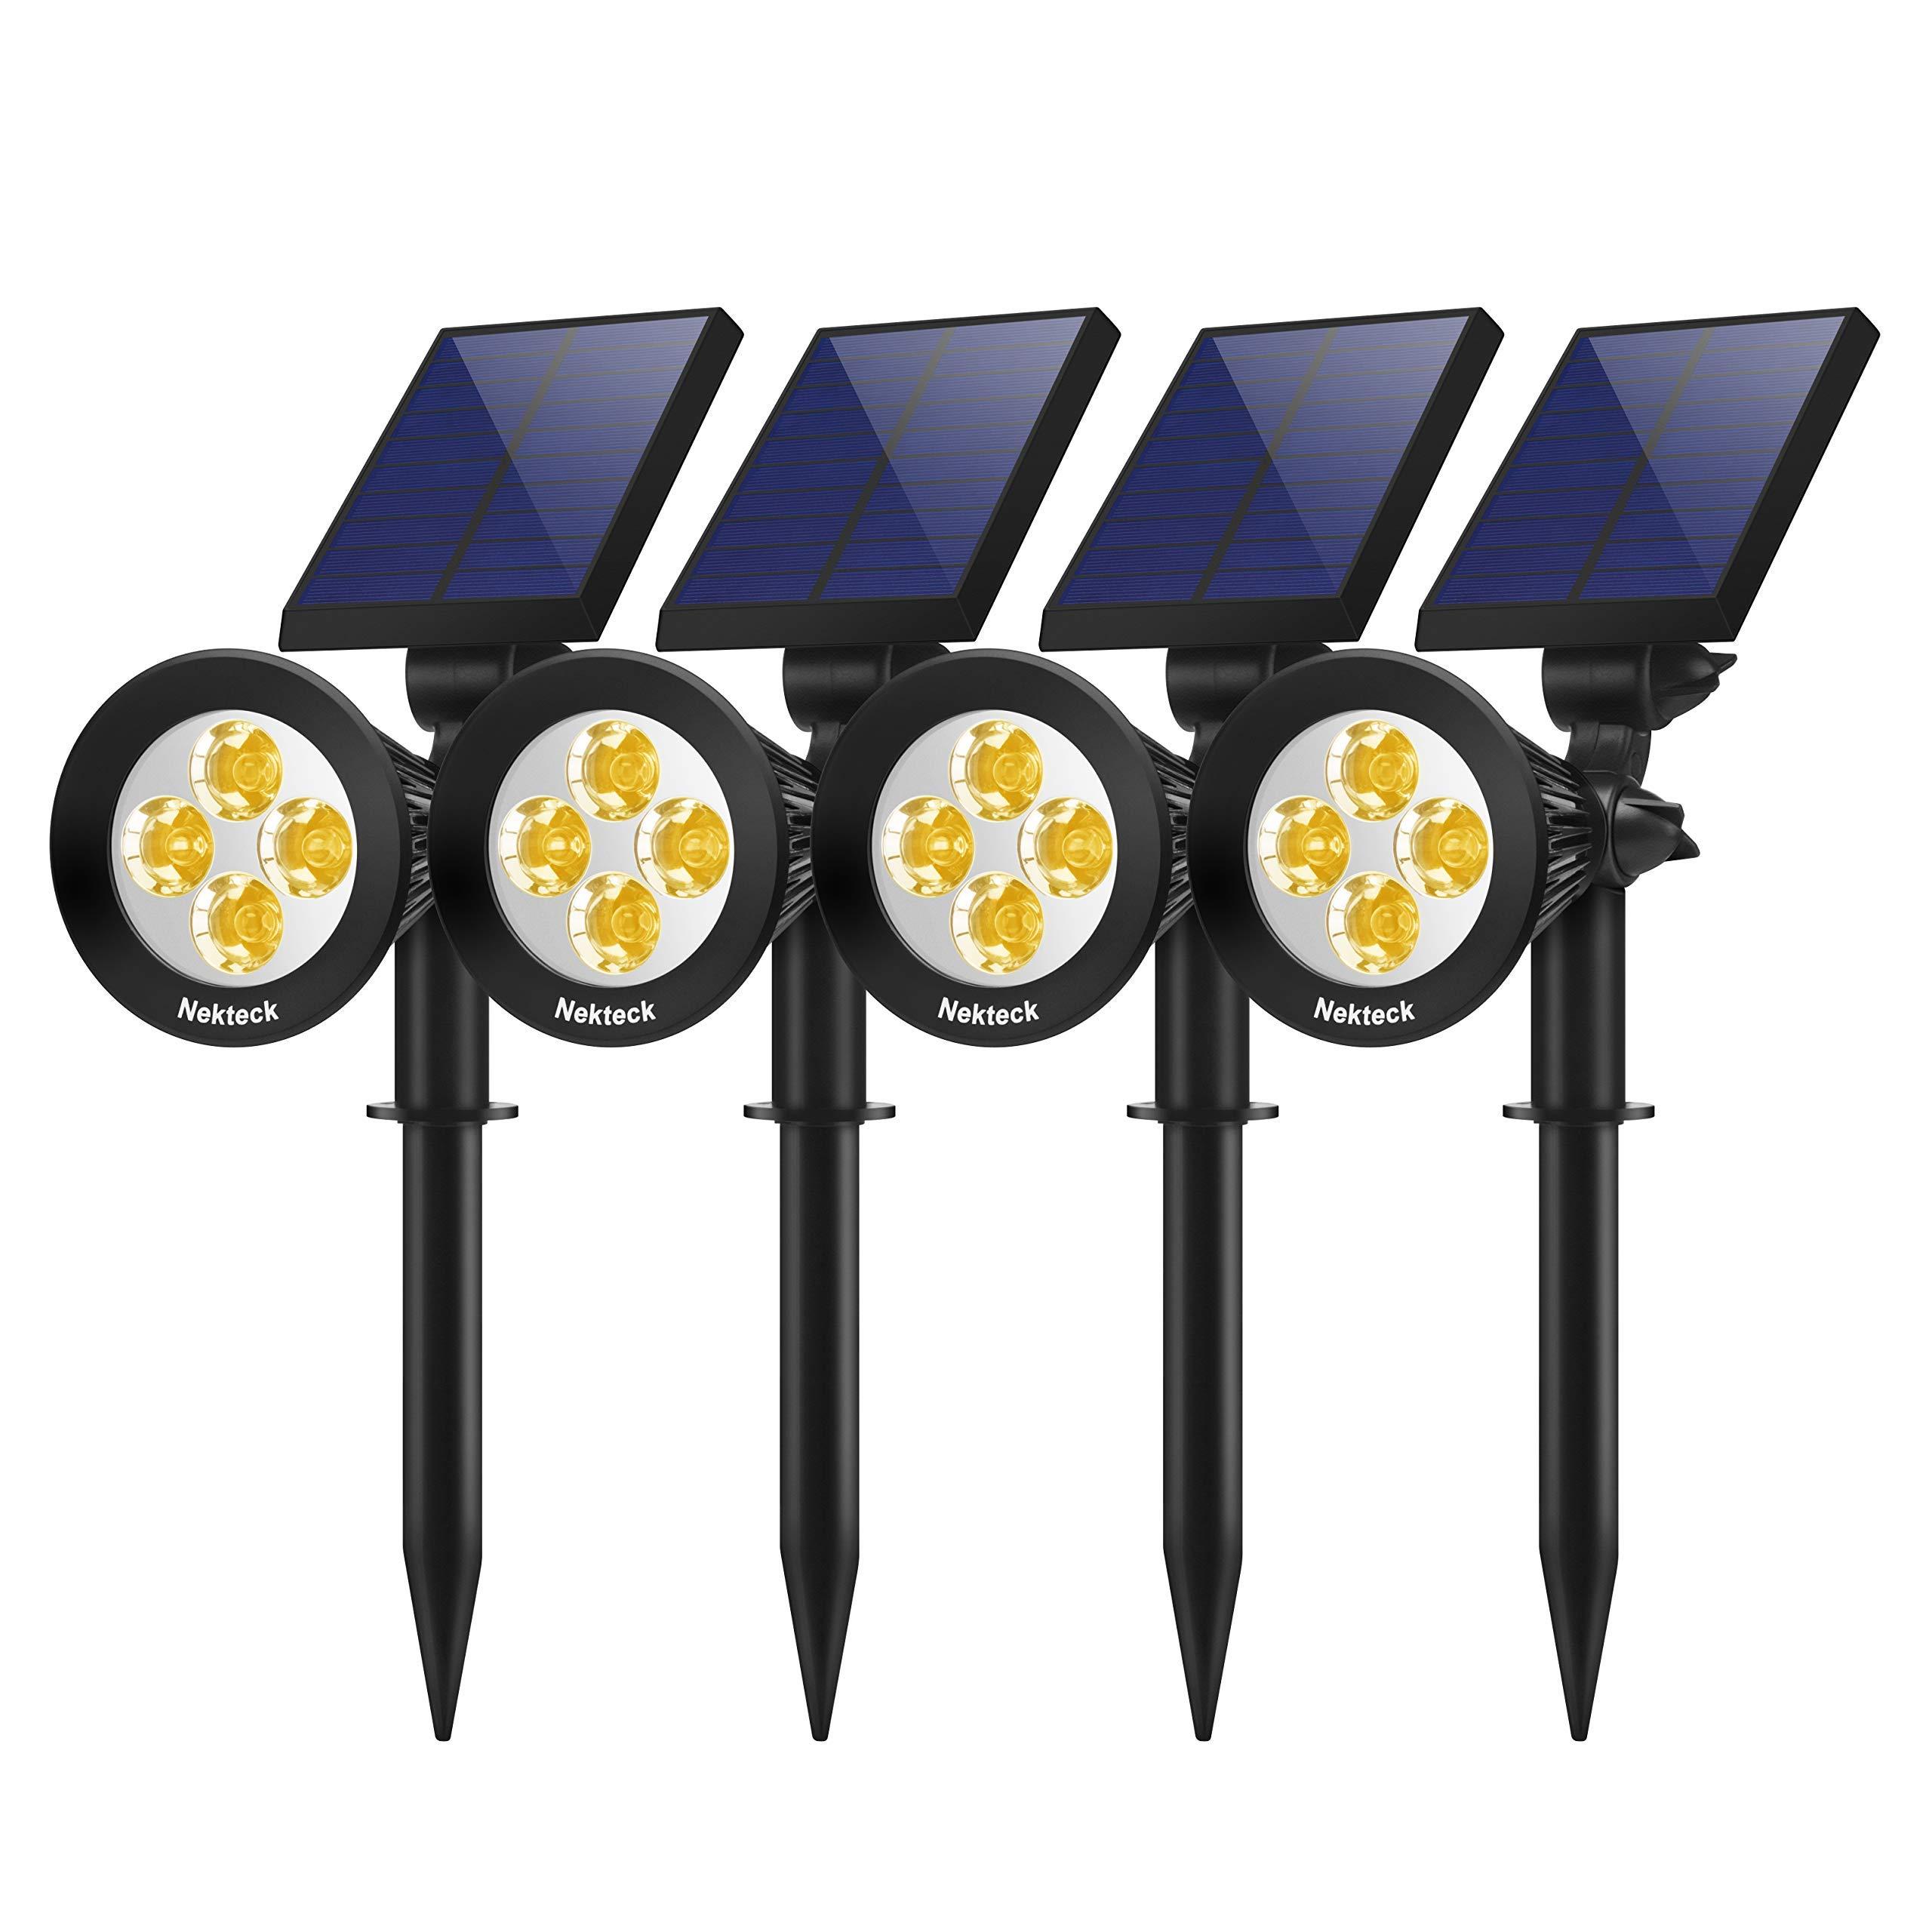 Nekteck Solar Lights Outdoor, 2-in-1 Solar Spotlights Powered 4 LED Adjustable Wall Light Landscape Lighting, Bright and Dark Sensing, Auto On/Off for Yard, Pathway, Walkway, Garden, Driveway, 4 Pack